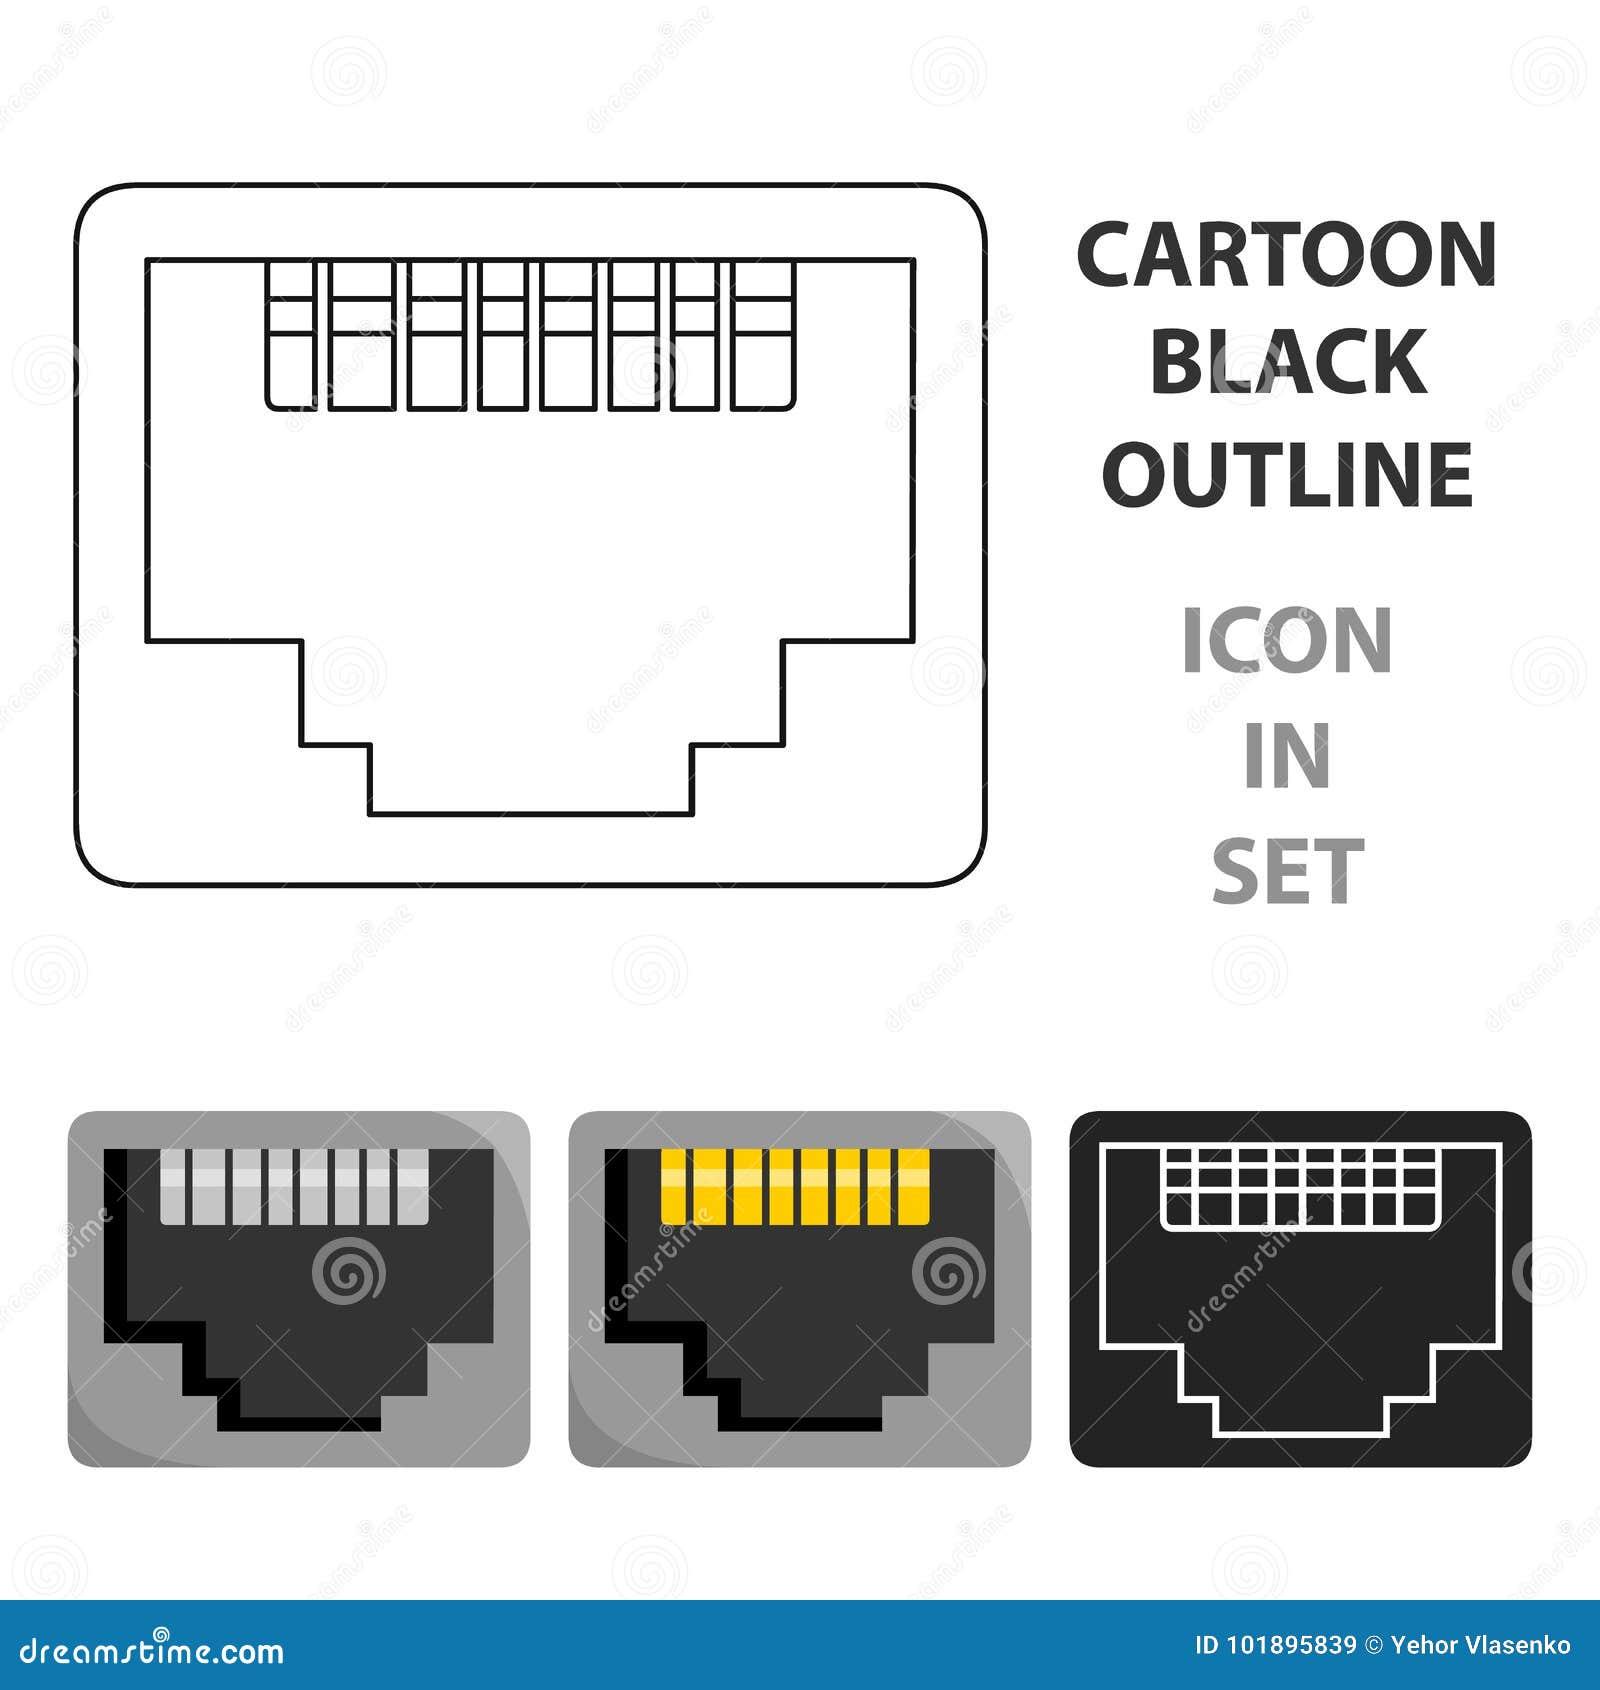 Network port symbol choice image symbol and sign ideas lan port icon in cartoon style isolated on white background lan port icon in cartoon style buycottarizona